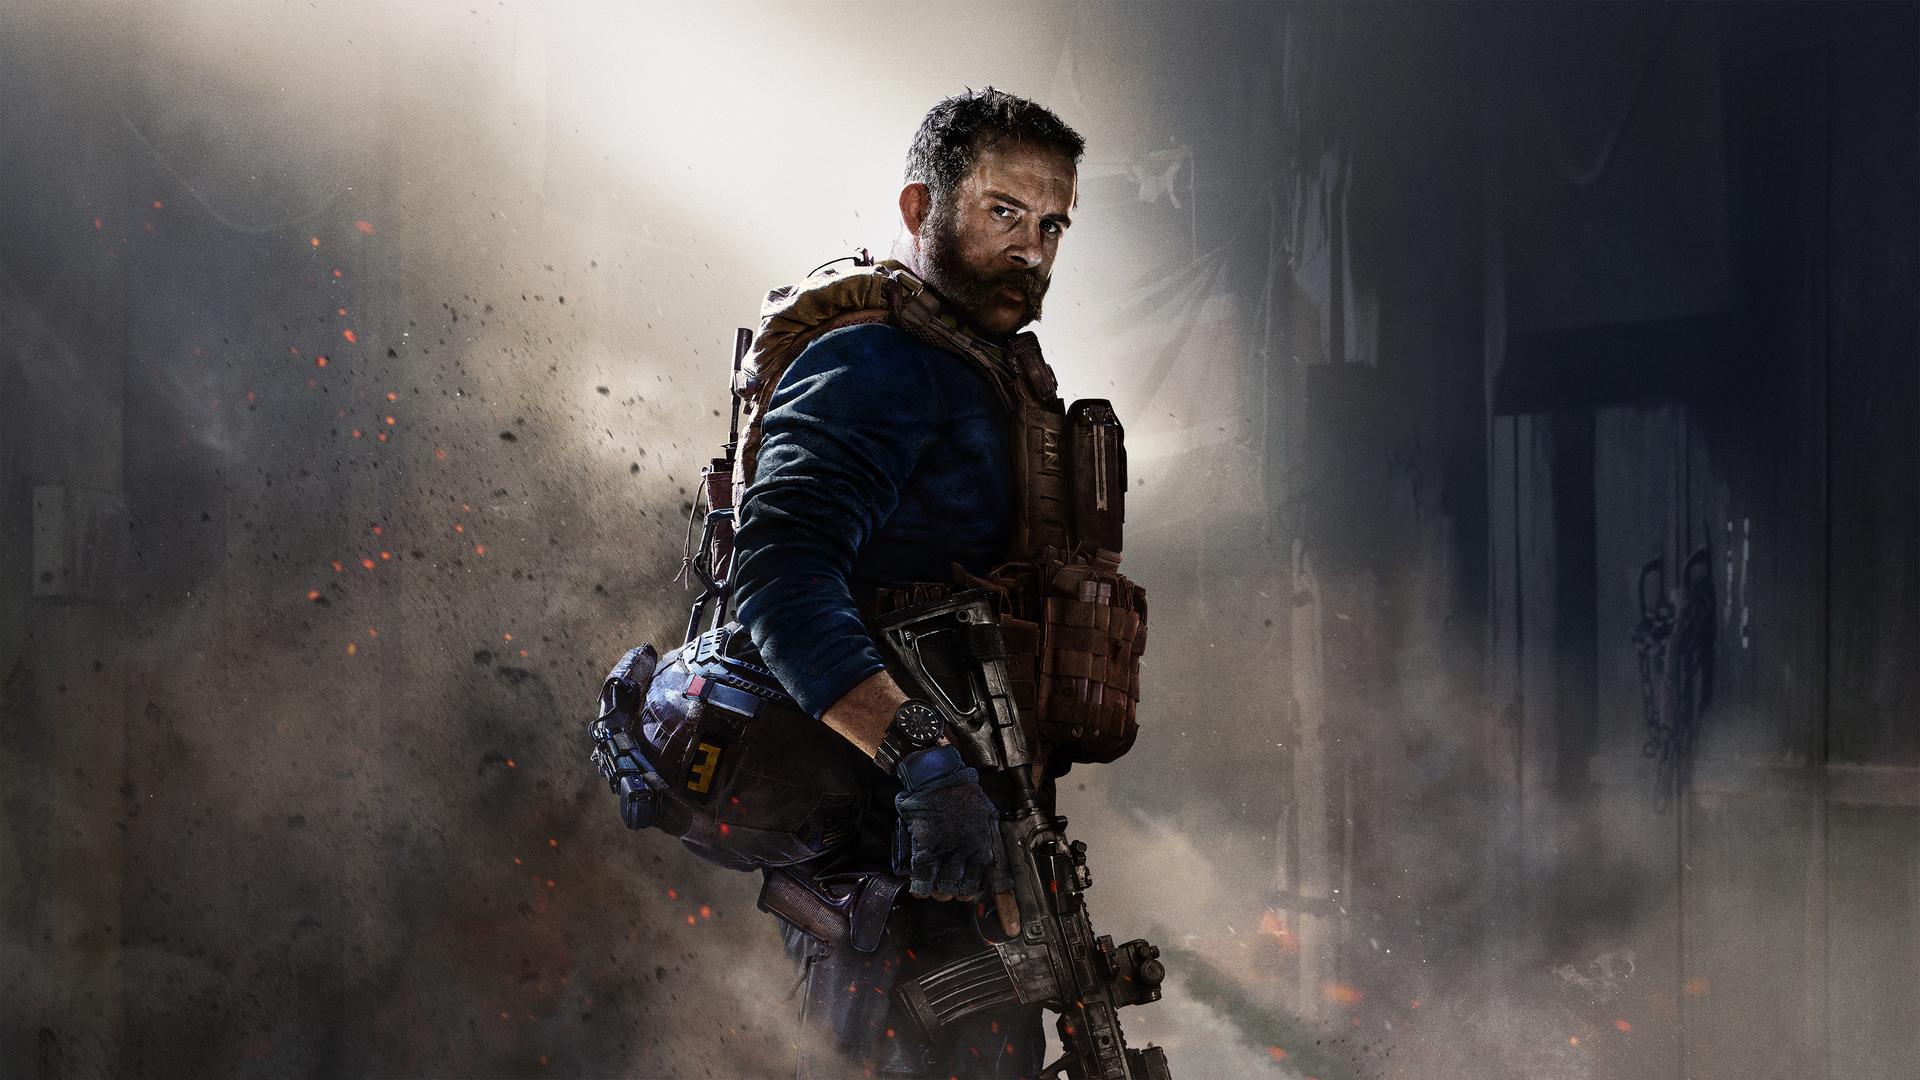 1920x1080 Call Of Duty Modern Warfare 2019 4k Laptop Full Hd 1080p